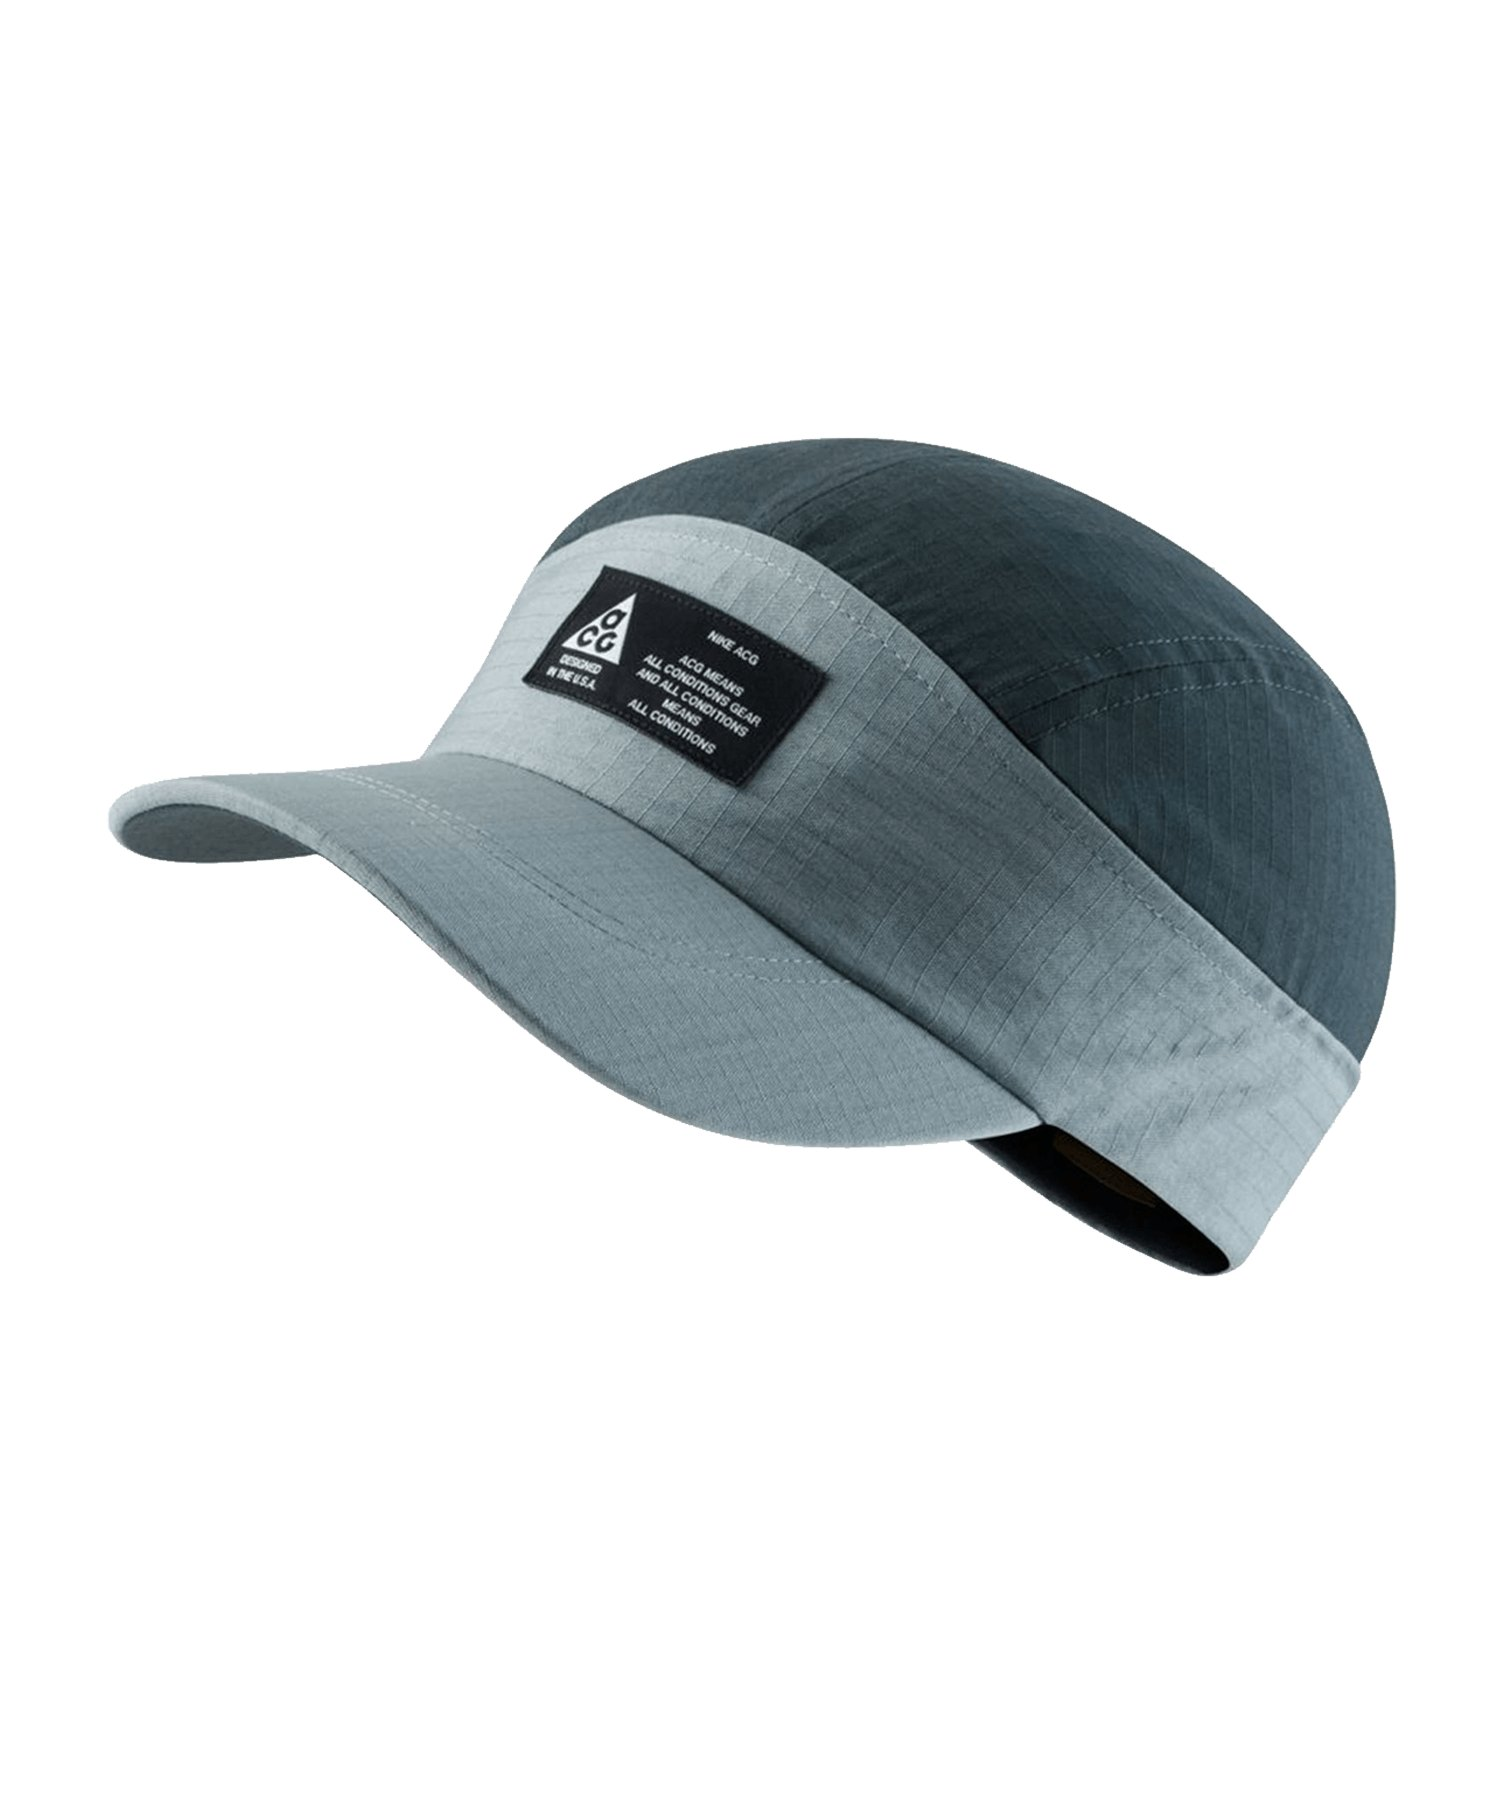 Nike ACG Tailwind Visor Cap Grau F041 - grau